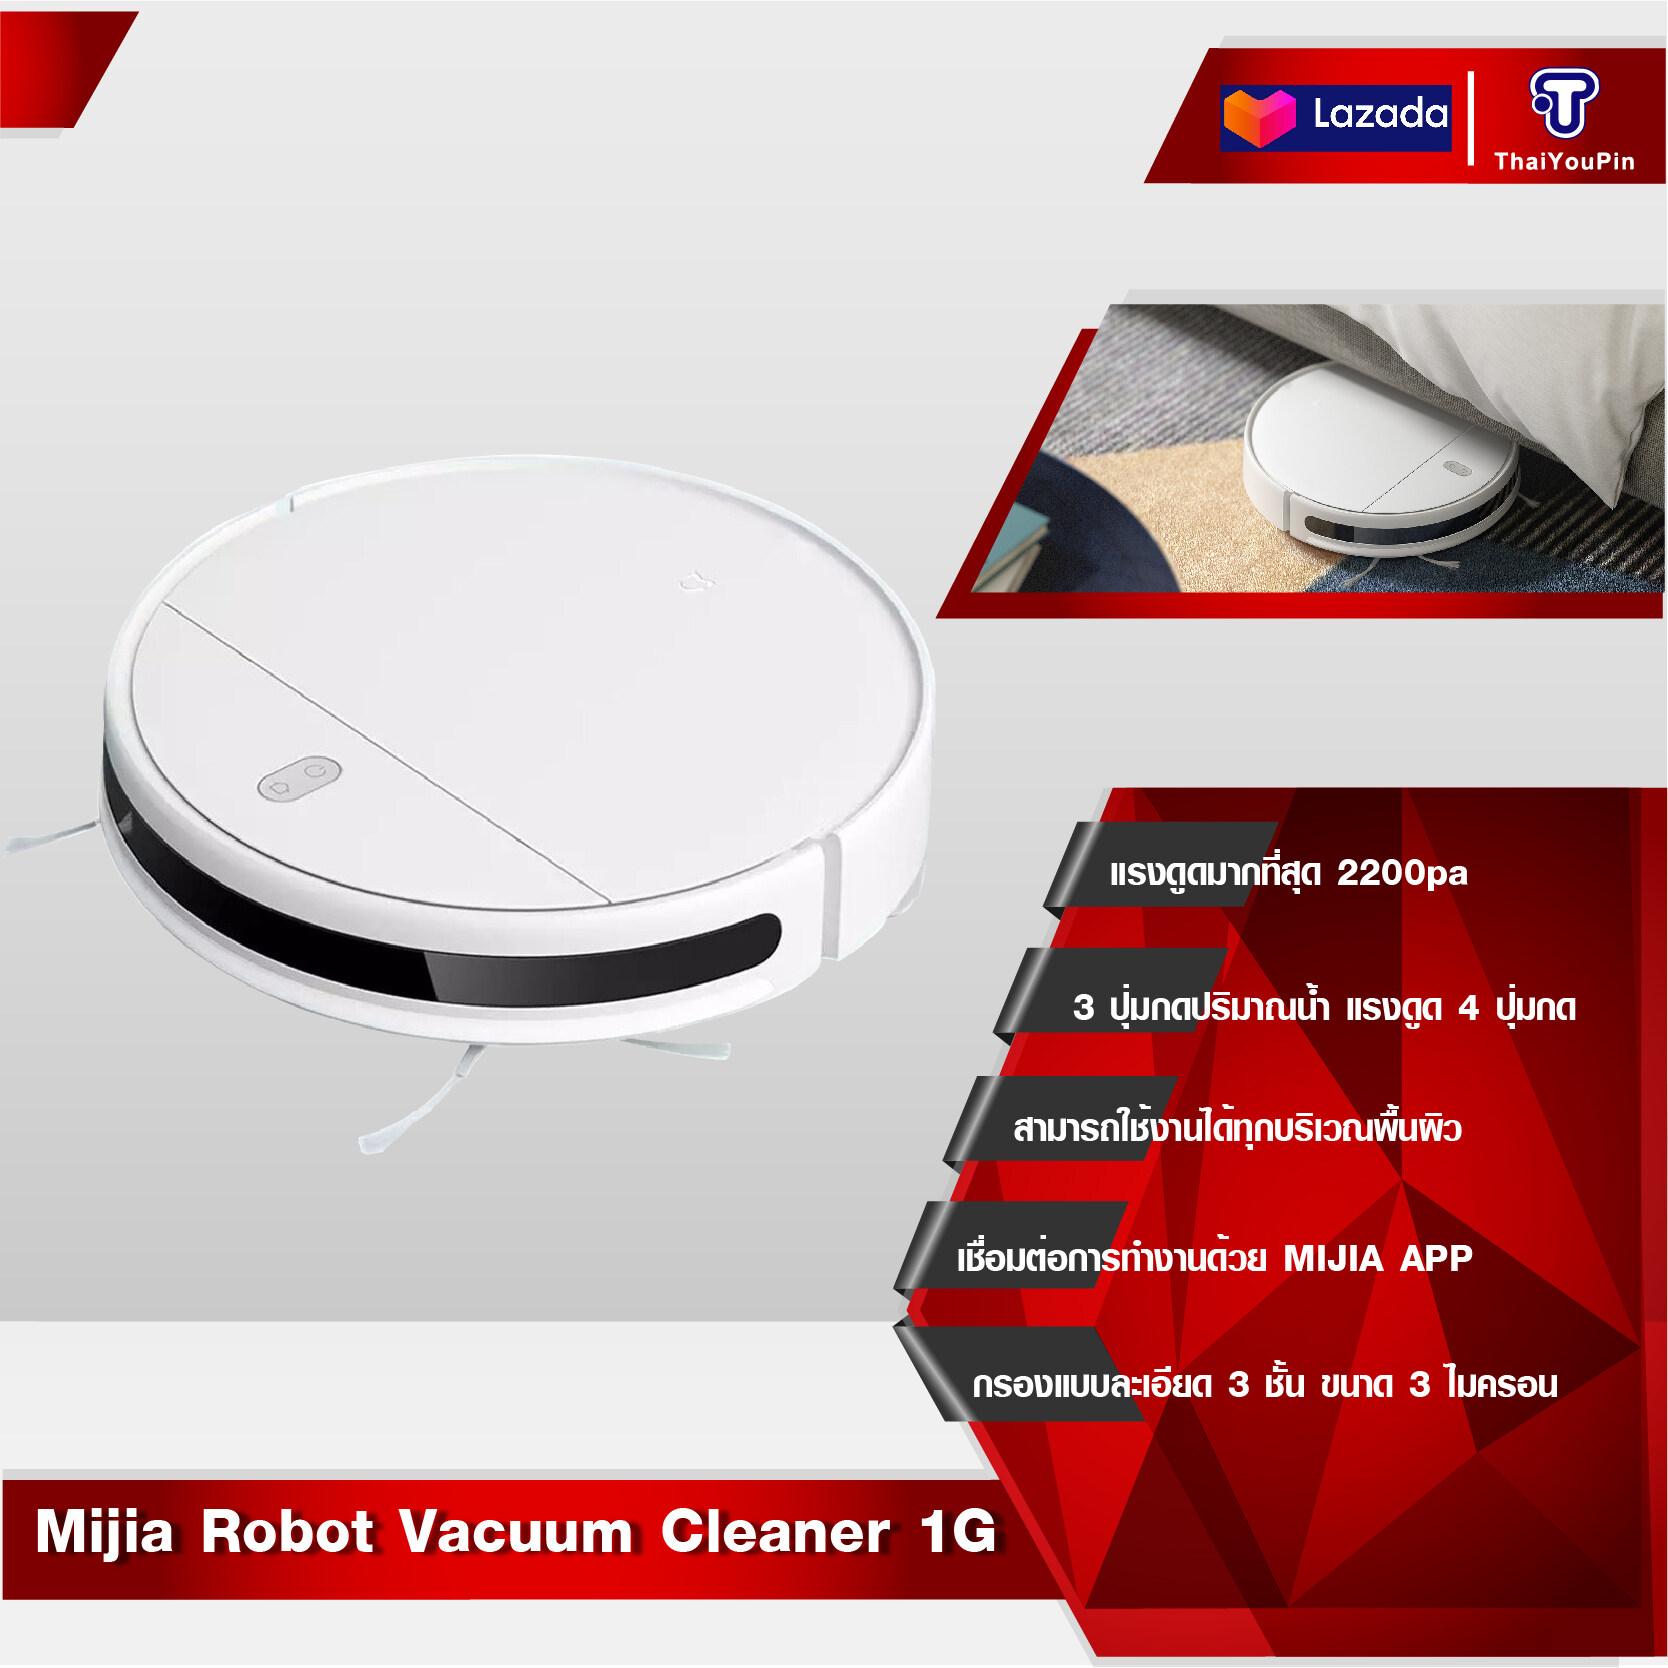 Xiaomi Mijia Robot G1 Vacuum and mob Cleaner (MJSTG1) เครื่องดูดฝุ่นอัจฉริยะ หุ่นยนตร์ทำความสะอาดแบบไร้สาย หุ่นยนต์ดูดฝุ่น